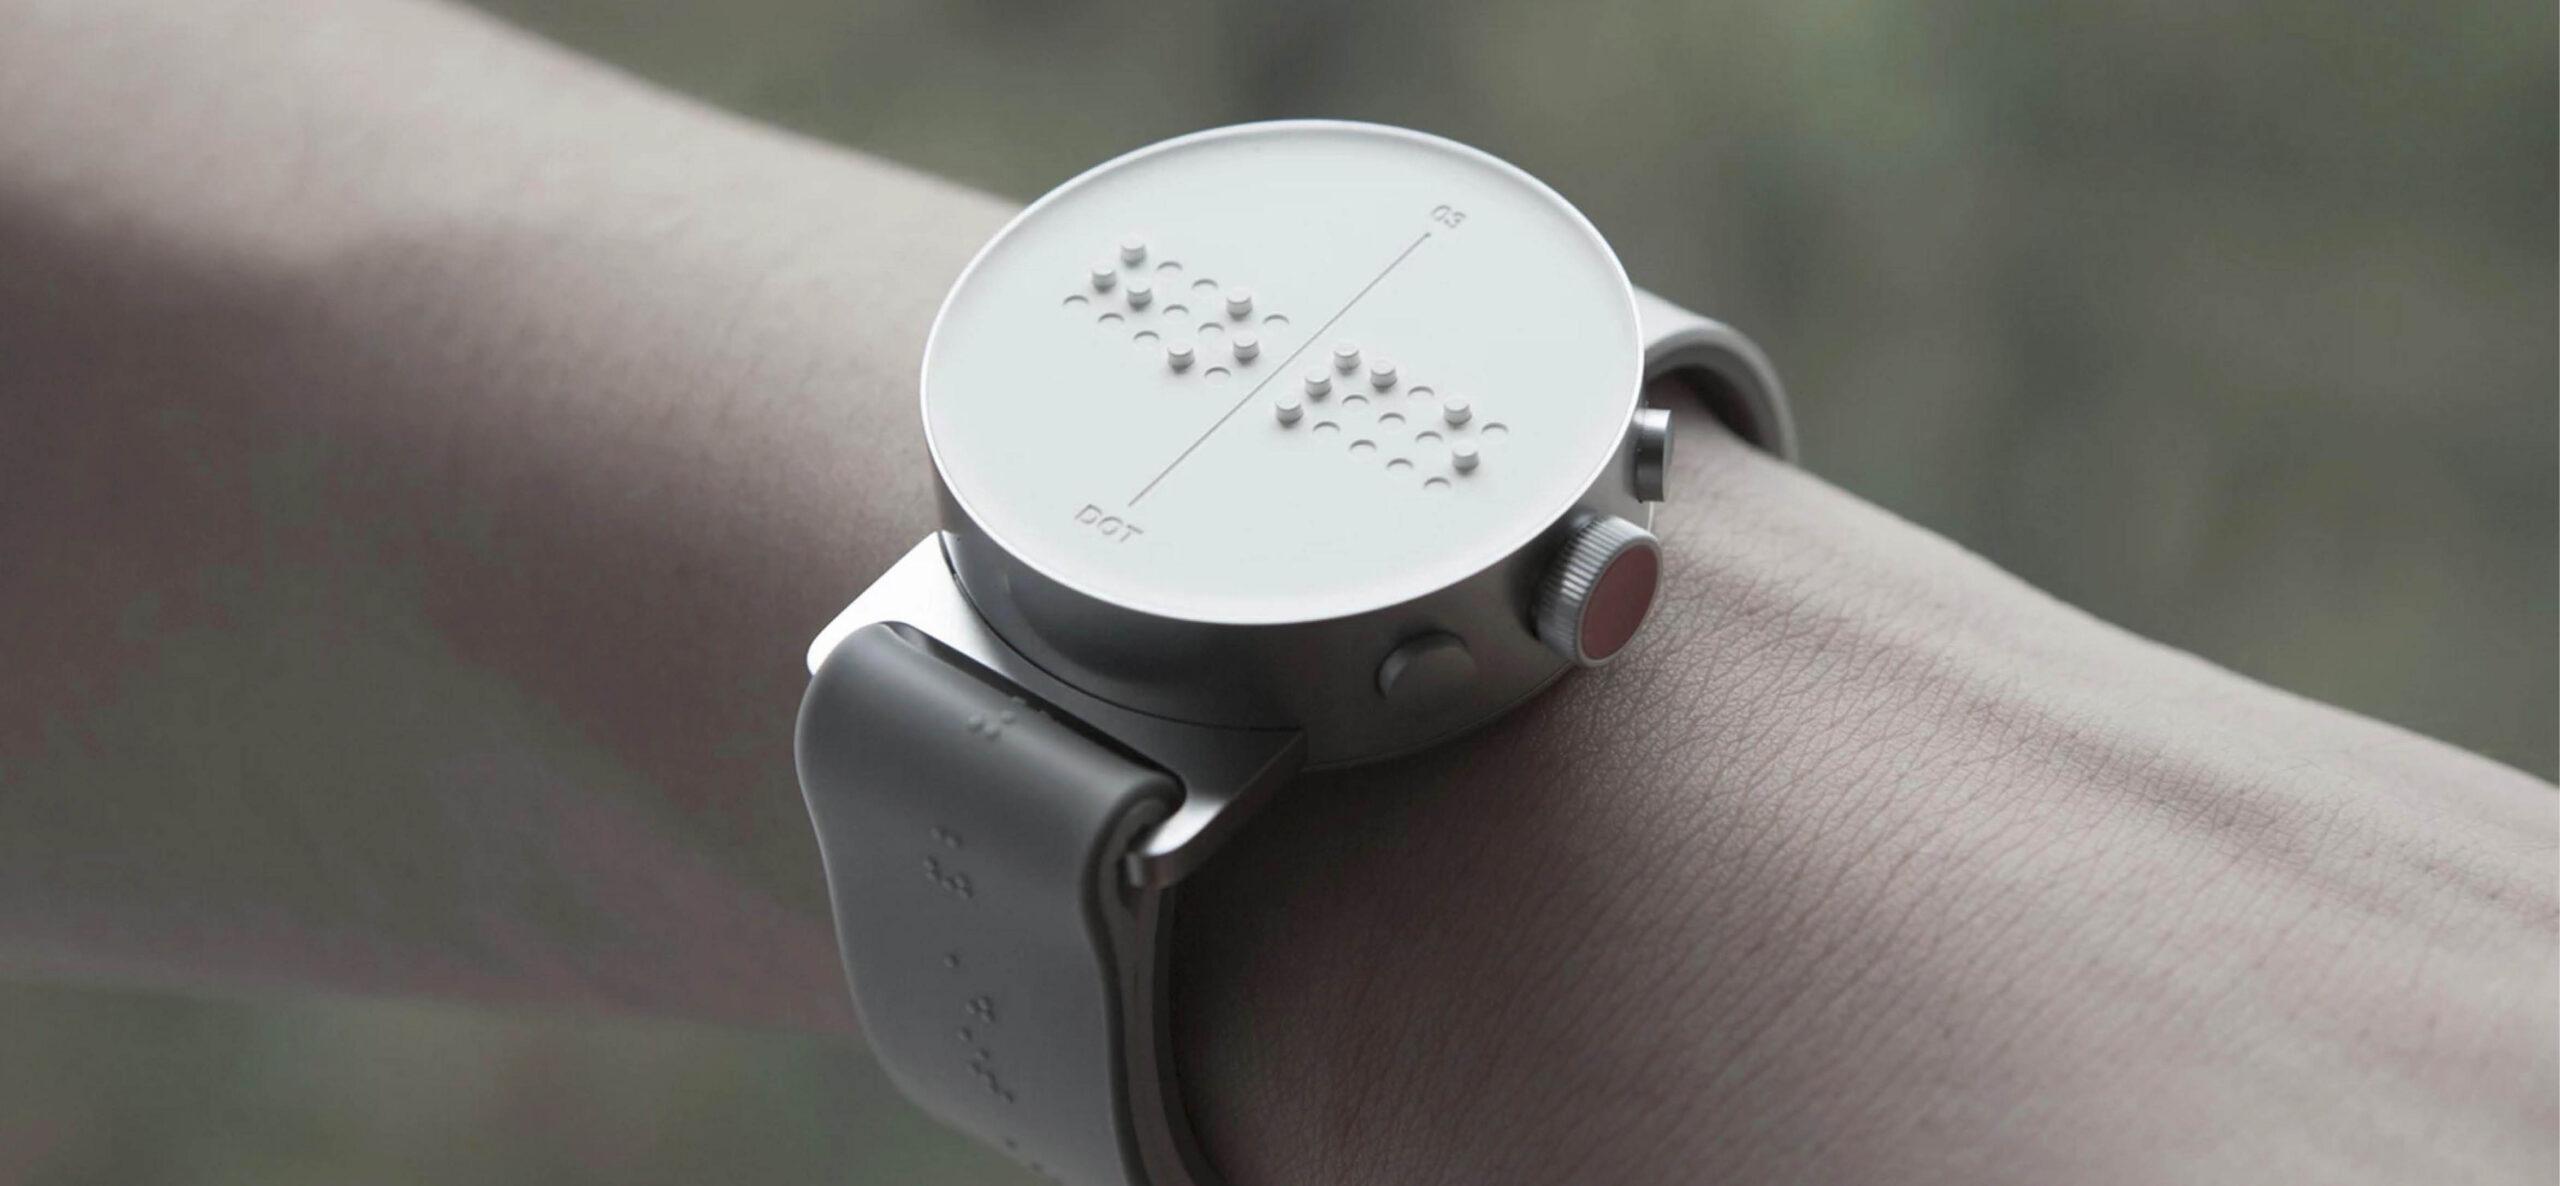 dot, lo smartwatch in Braille